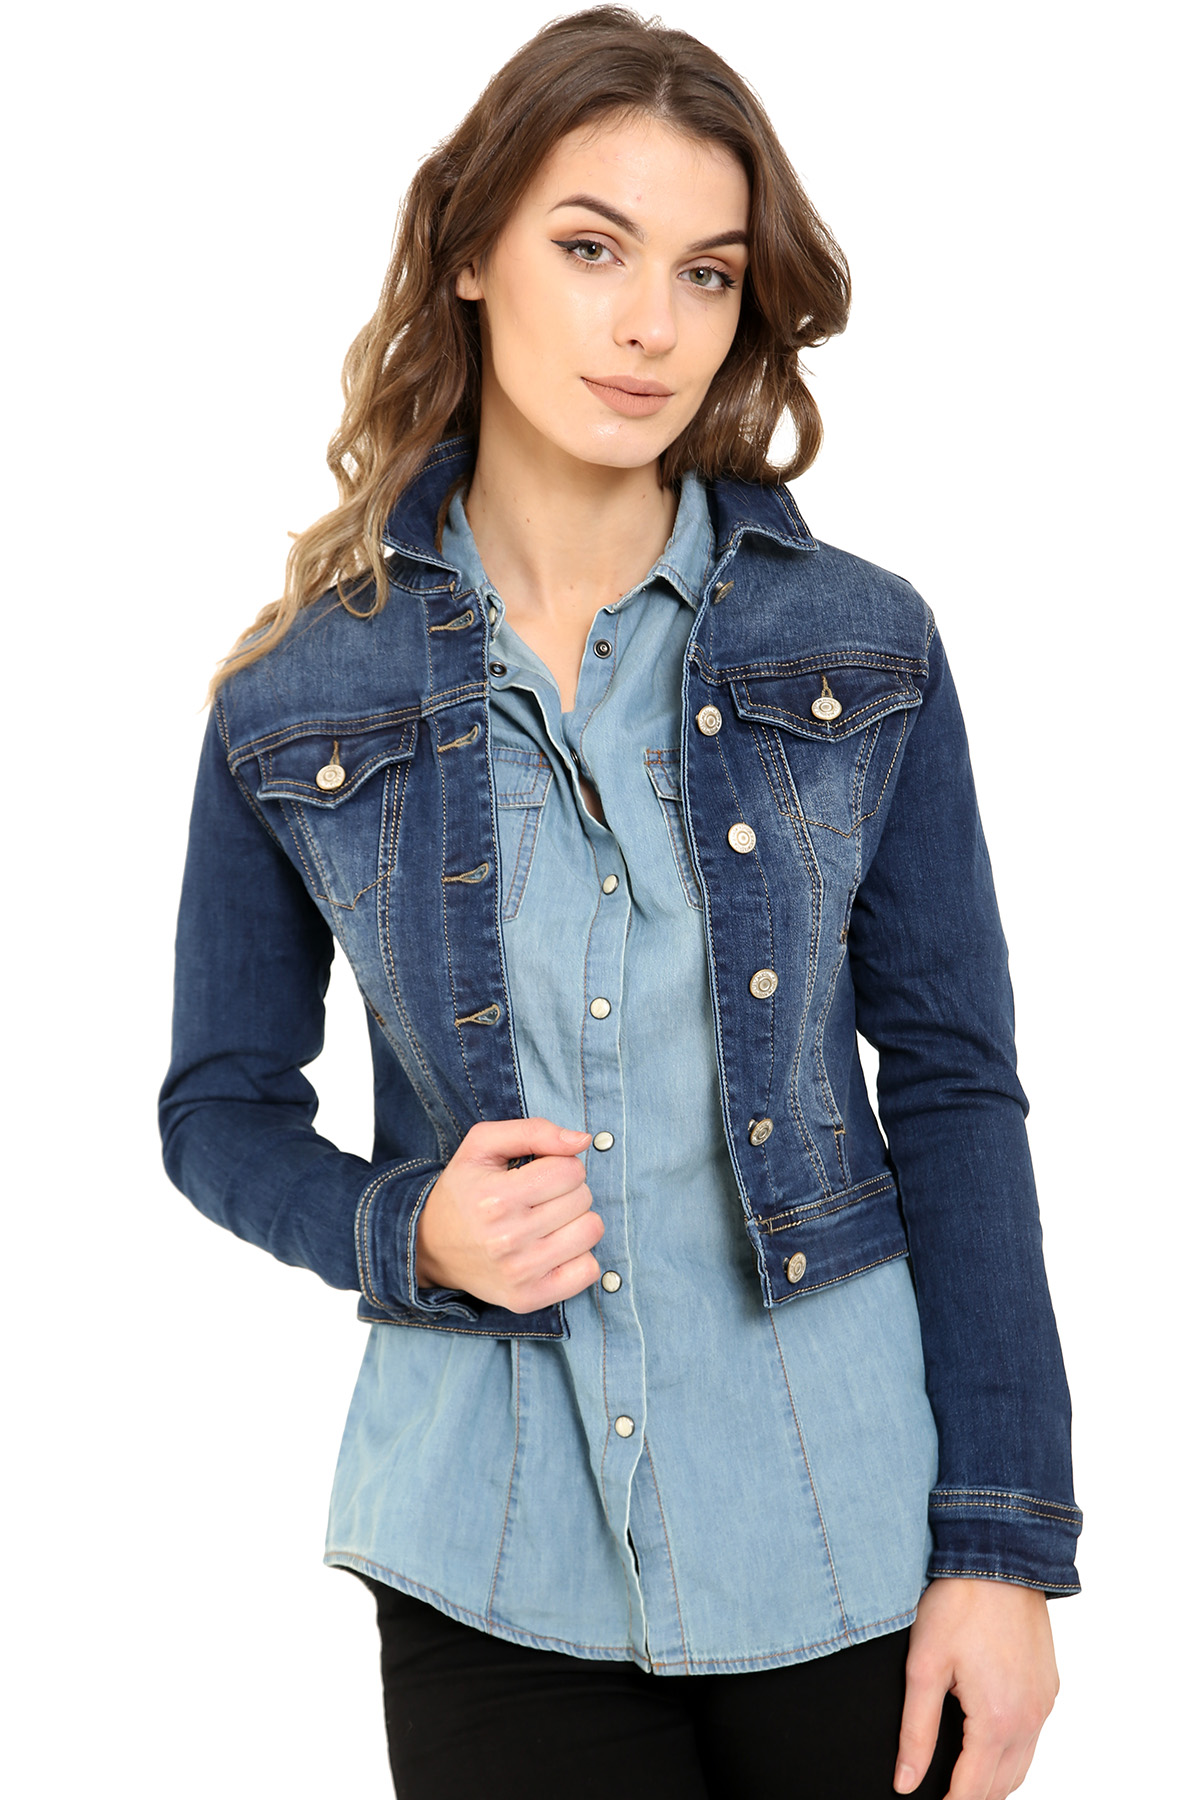 Leila Dark Blue Wash Denim Jacket - Shelikes e85a33cc6